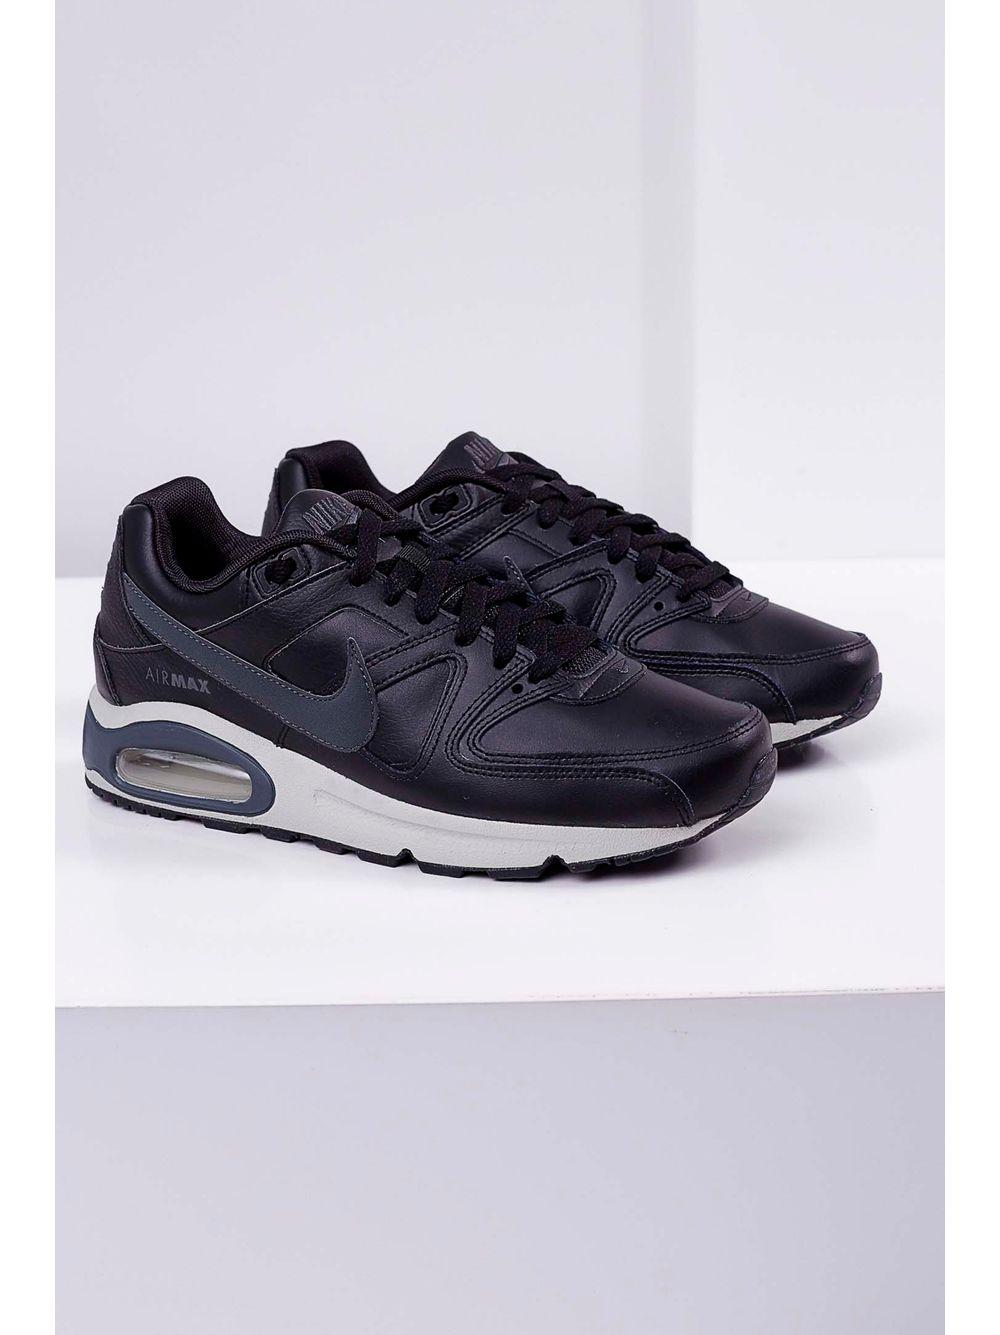 067bbd6c8da95 Previous. Tenis-Nike-Air-Max-Command-Leather-Shoe-Preto ...